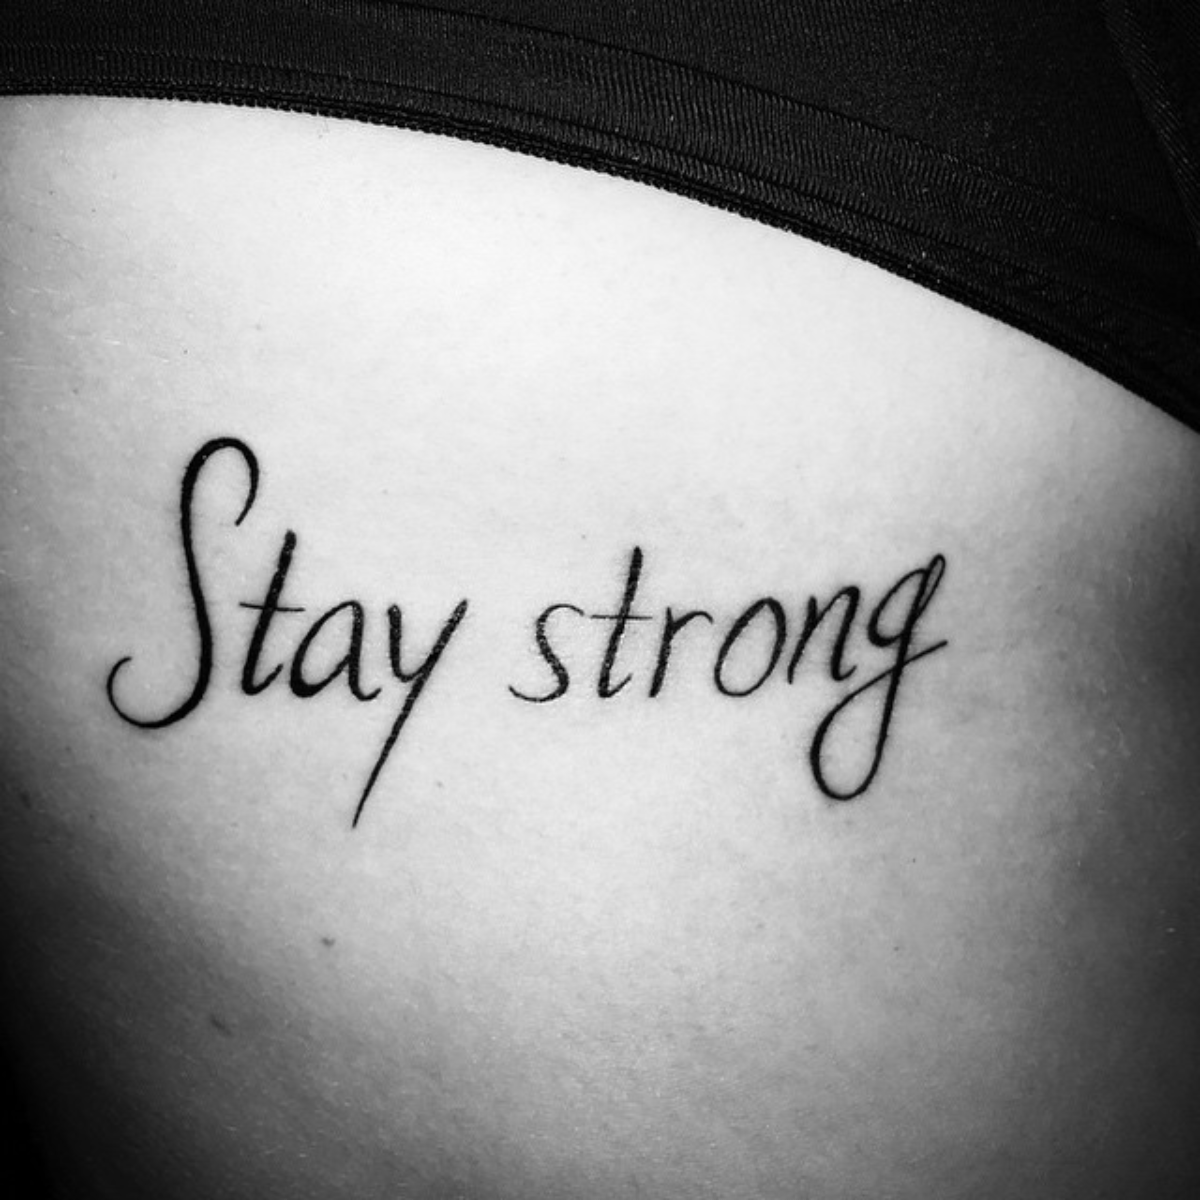 Palabras para tatuajes galerie tatouage - Stay strong tatouage ...